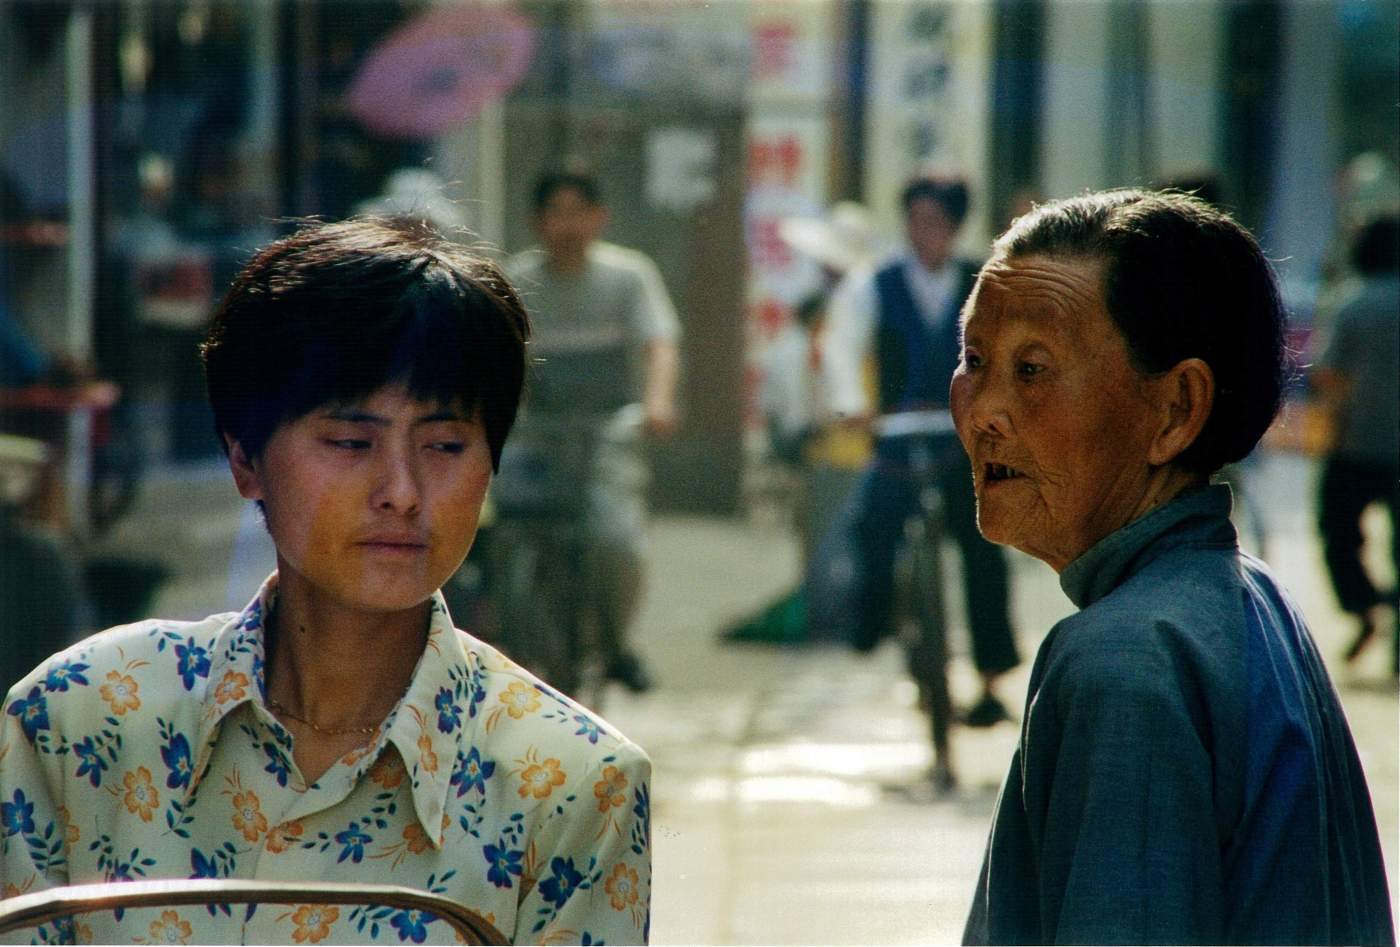 Agree to Disagree 毛澤東說得好,因為我們是為人民服務的,所以我們如果有缺點,就不怕別人批評指出。